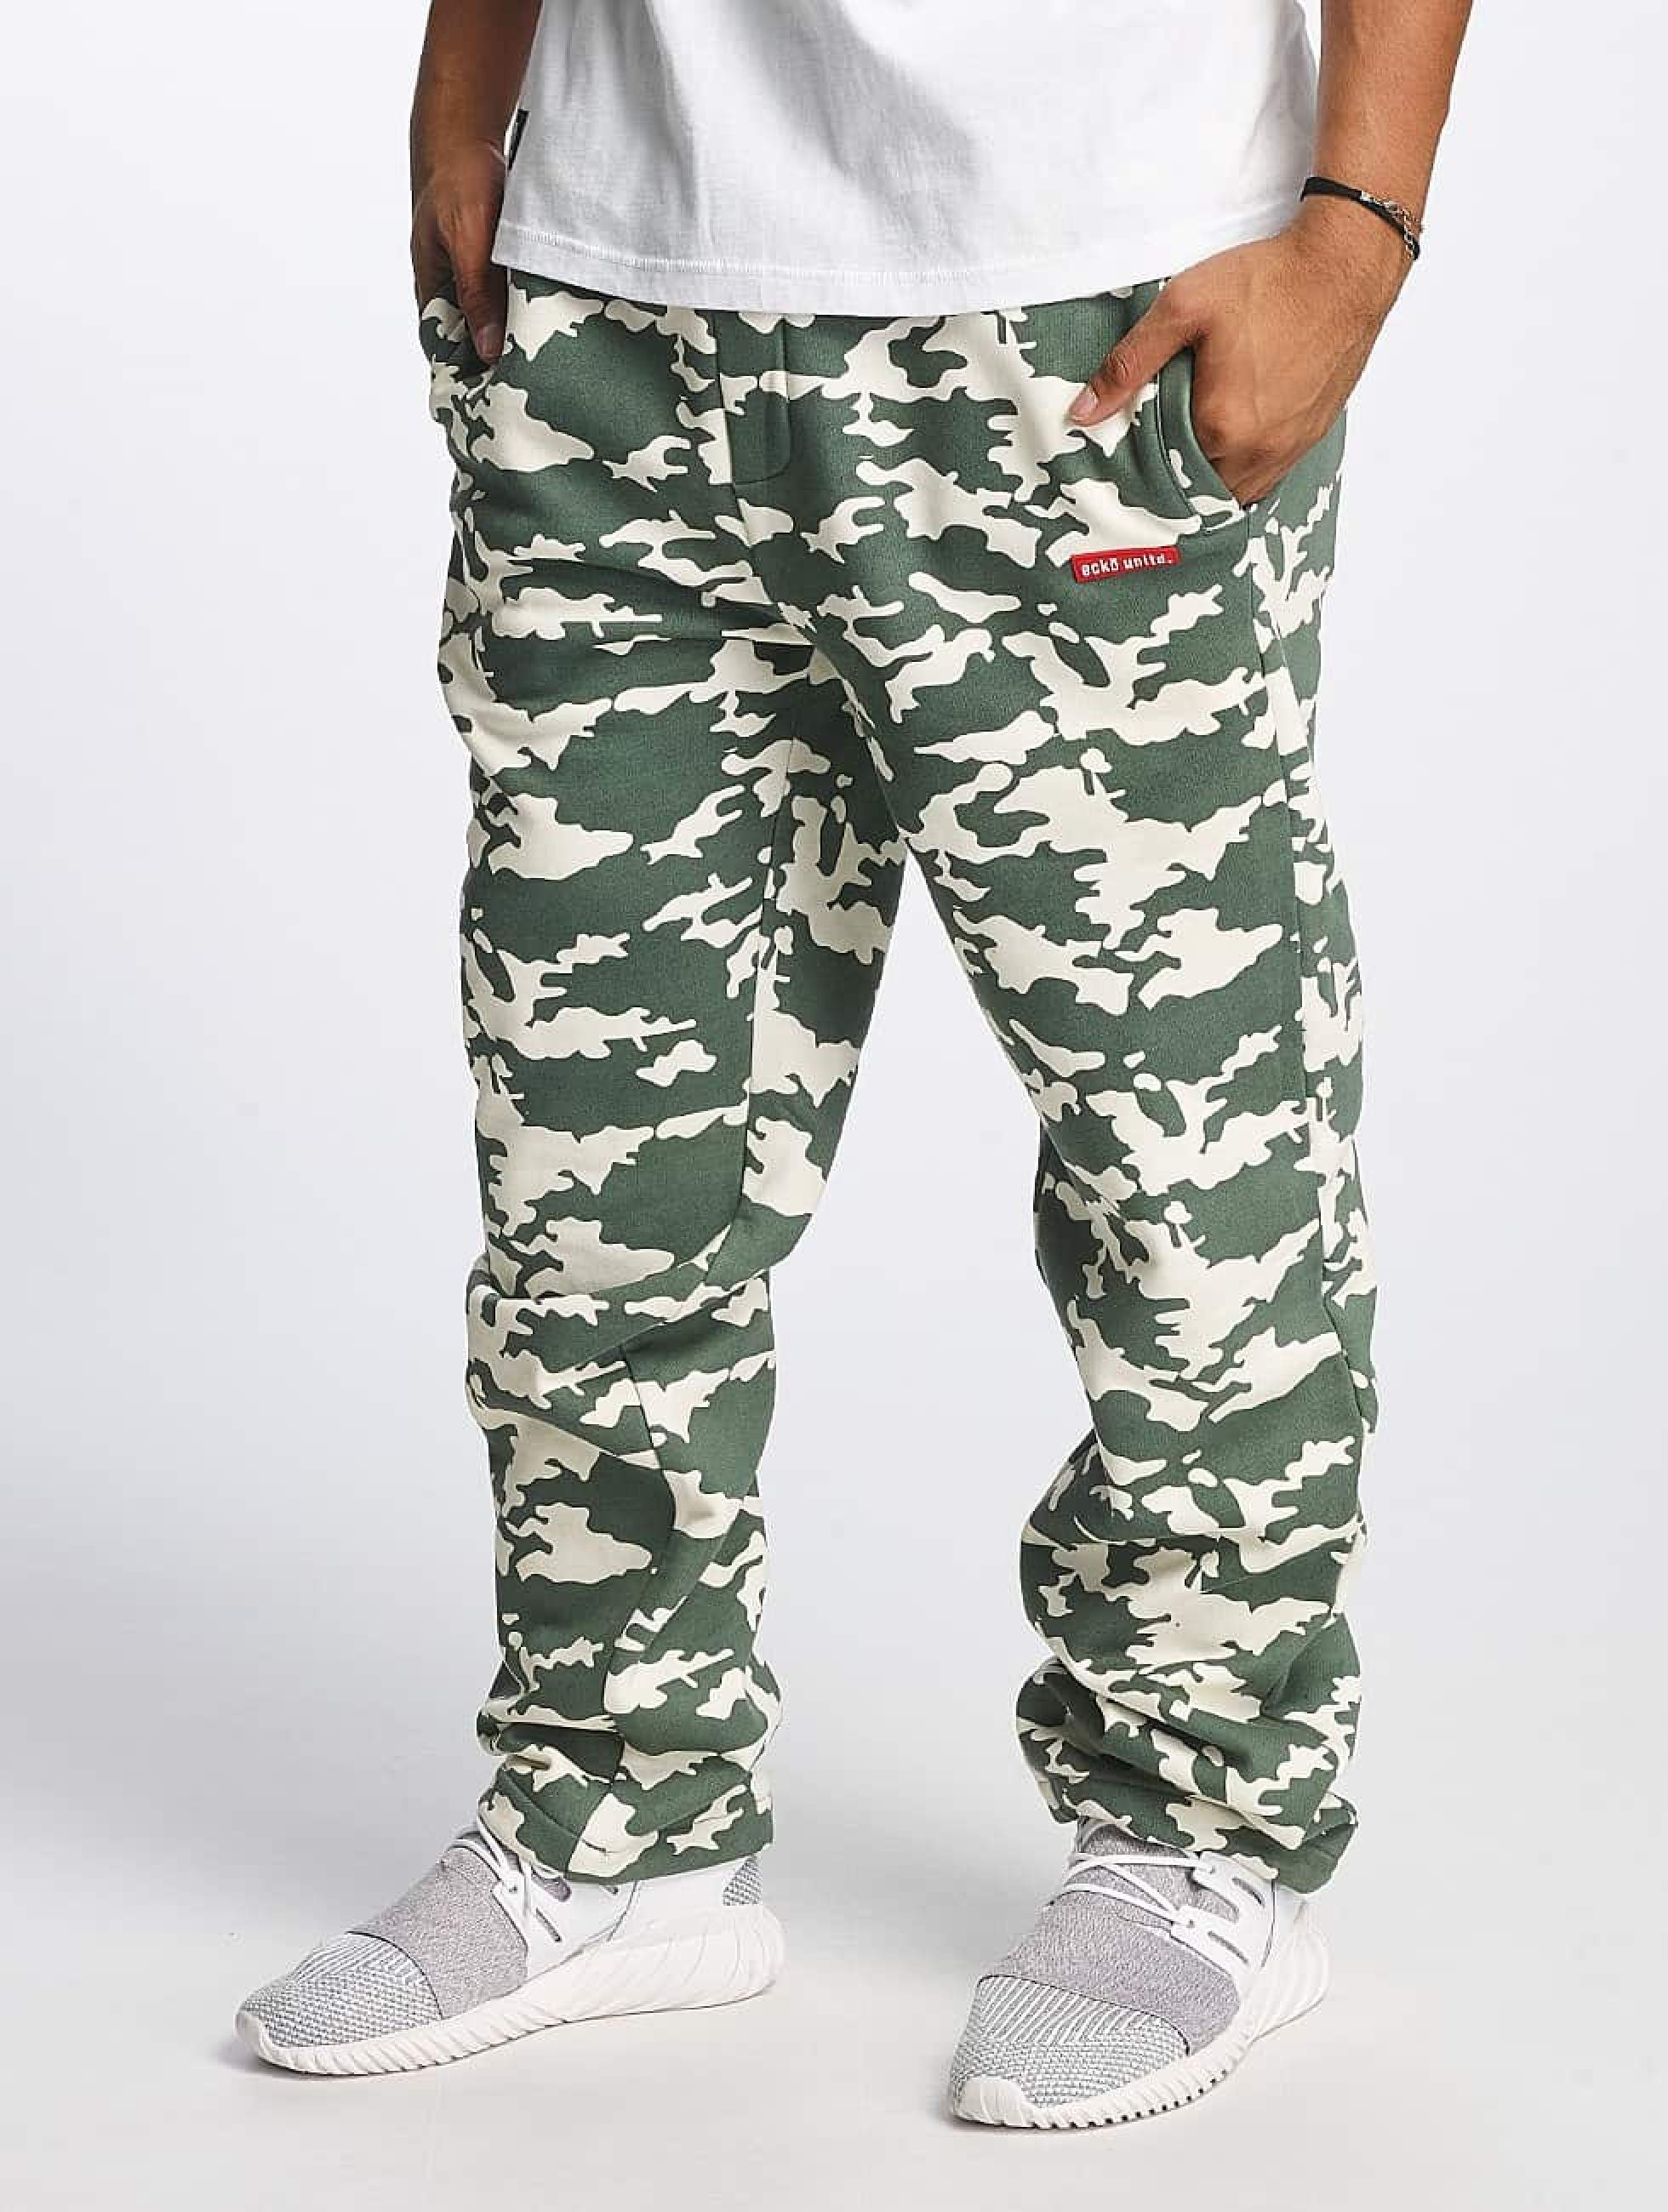 Ecko Unltd. / Sweat Pant BananaBeach in camouflage 4XL